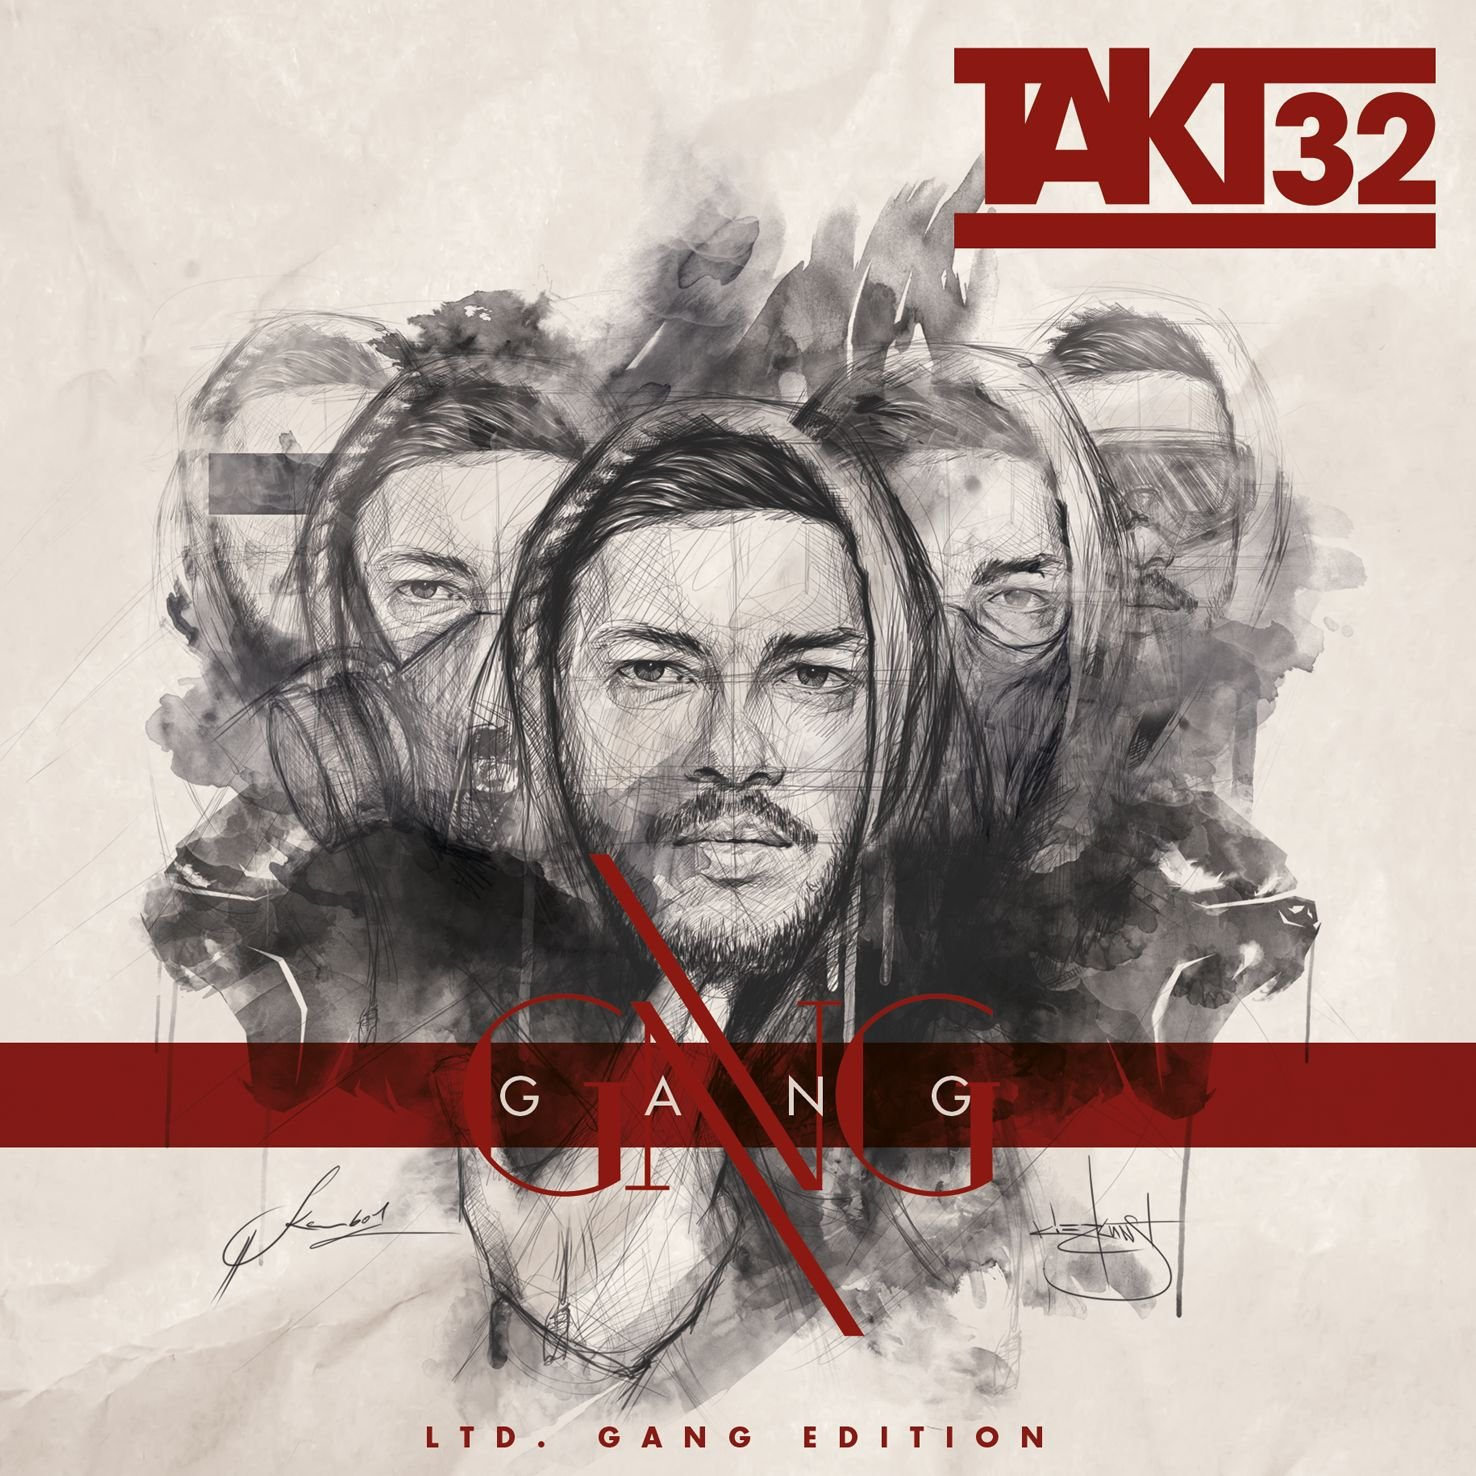 Takt32